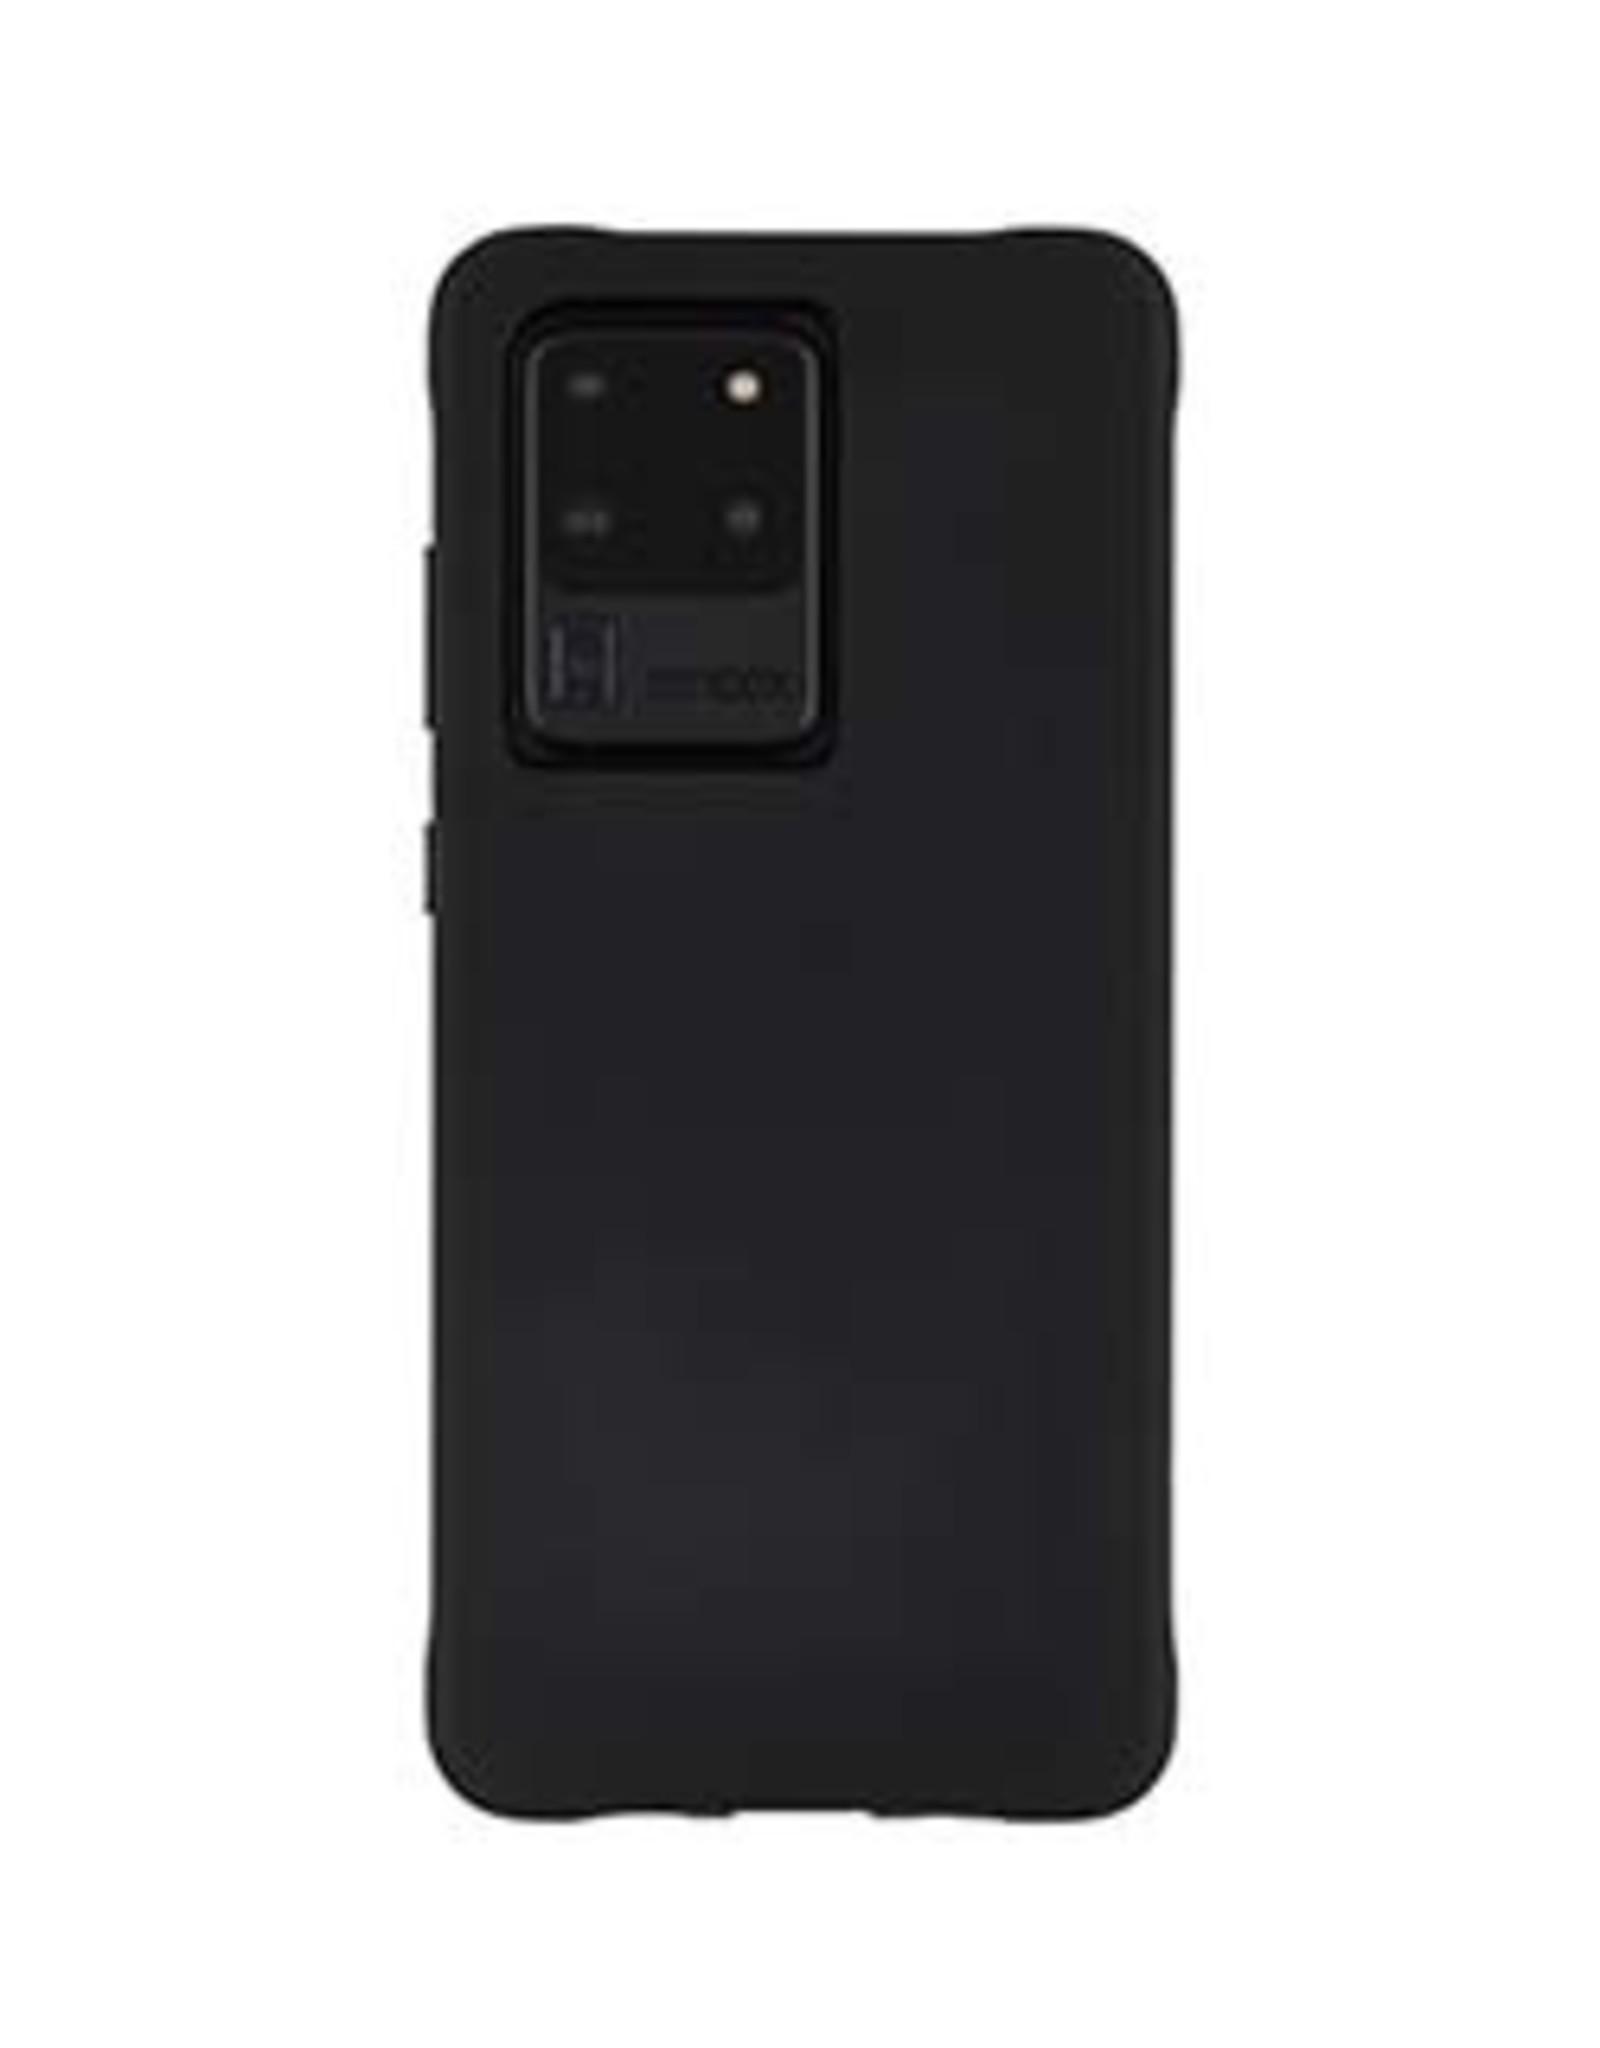 Case-Mate Case-Mate | Samsung Galaxy S20 Ultra  Black (Smoke) Tough Case15-06672